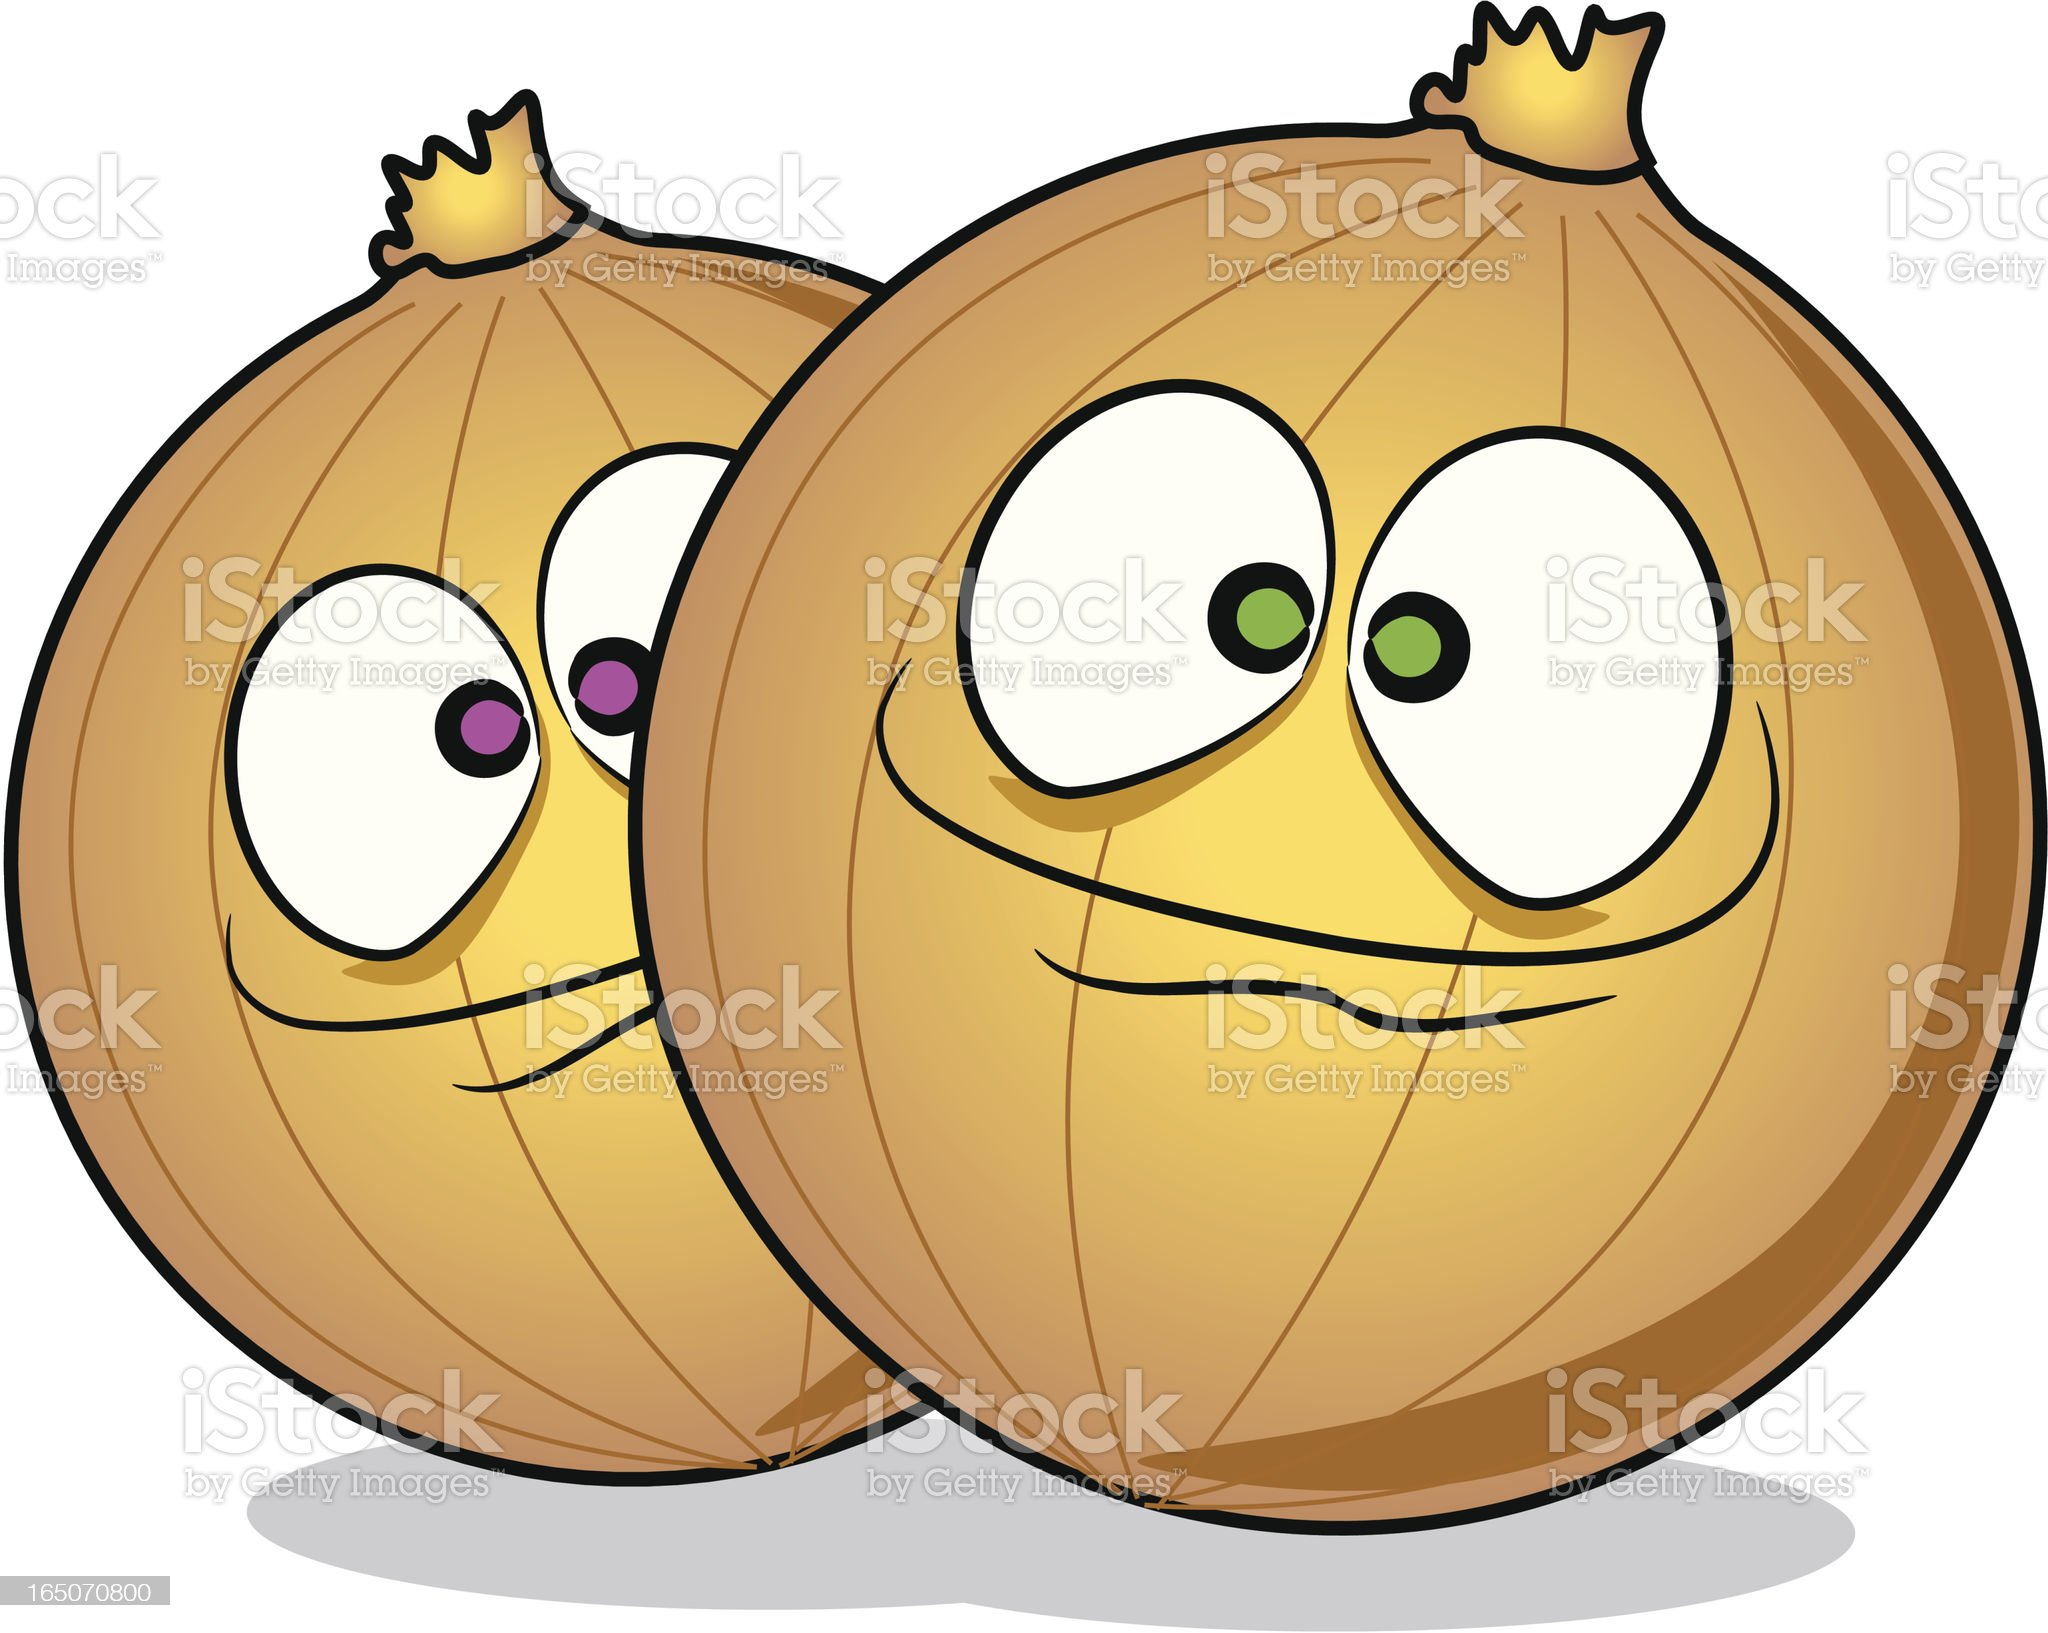 Onions Cartoon royalty-free stock vector art